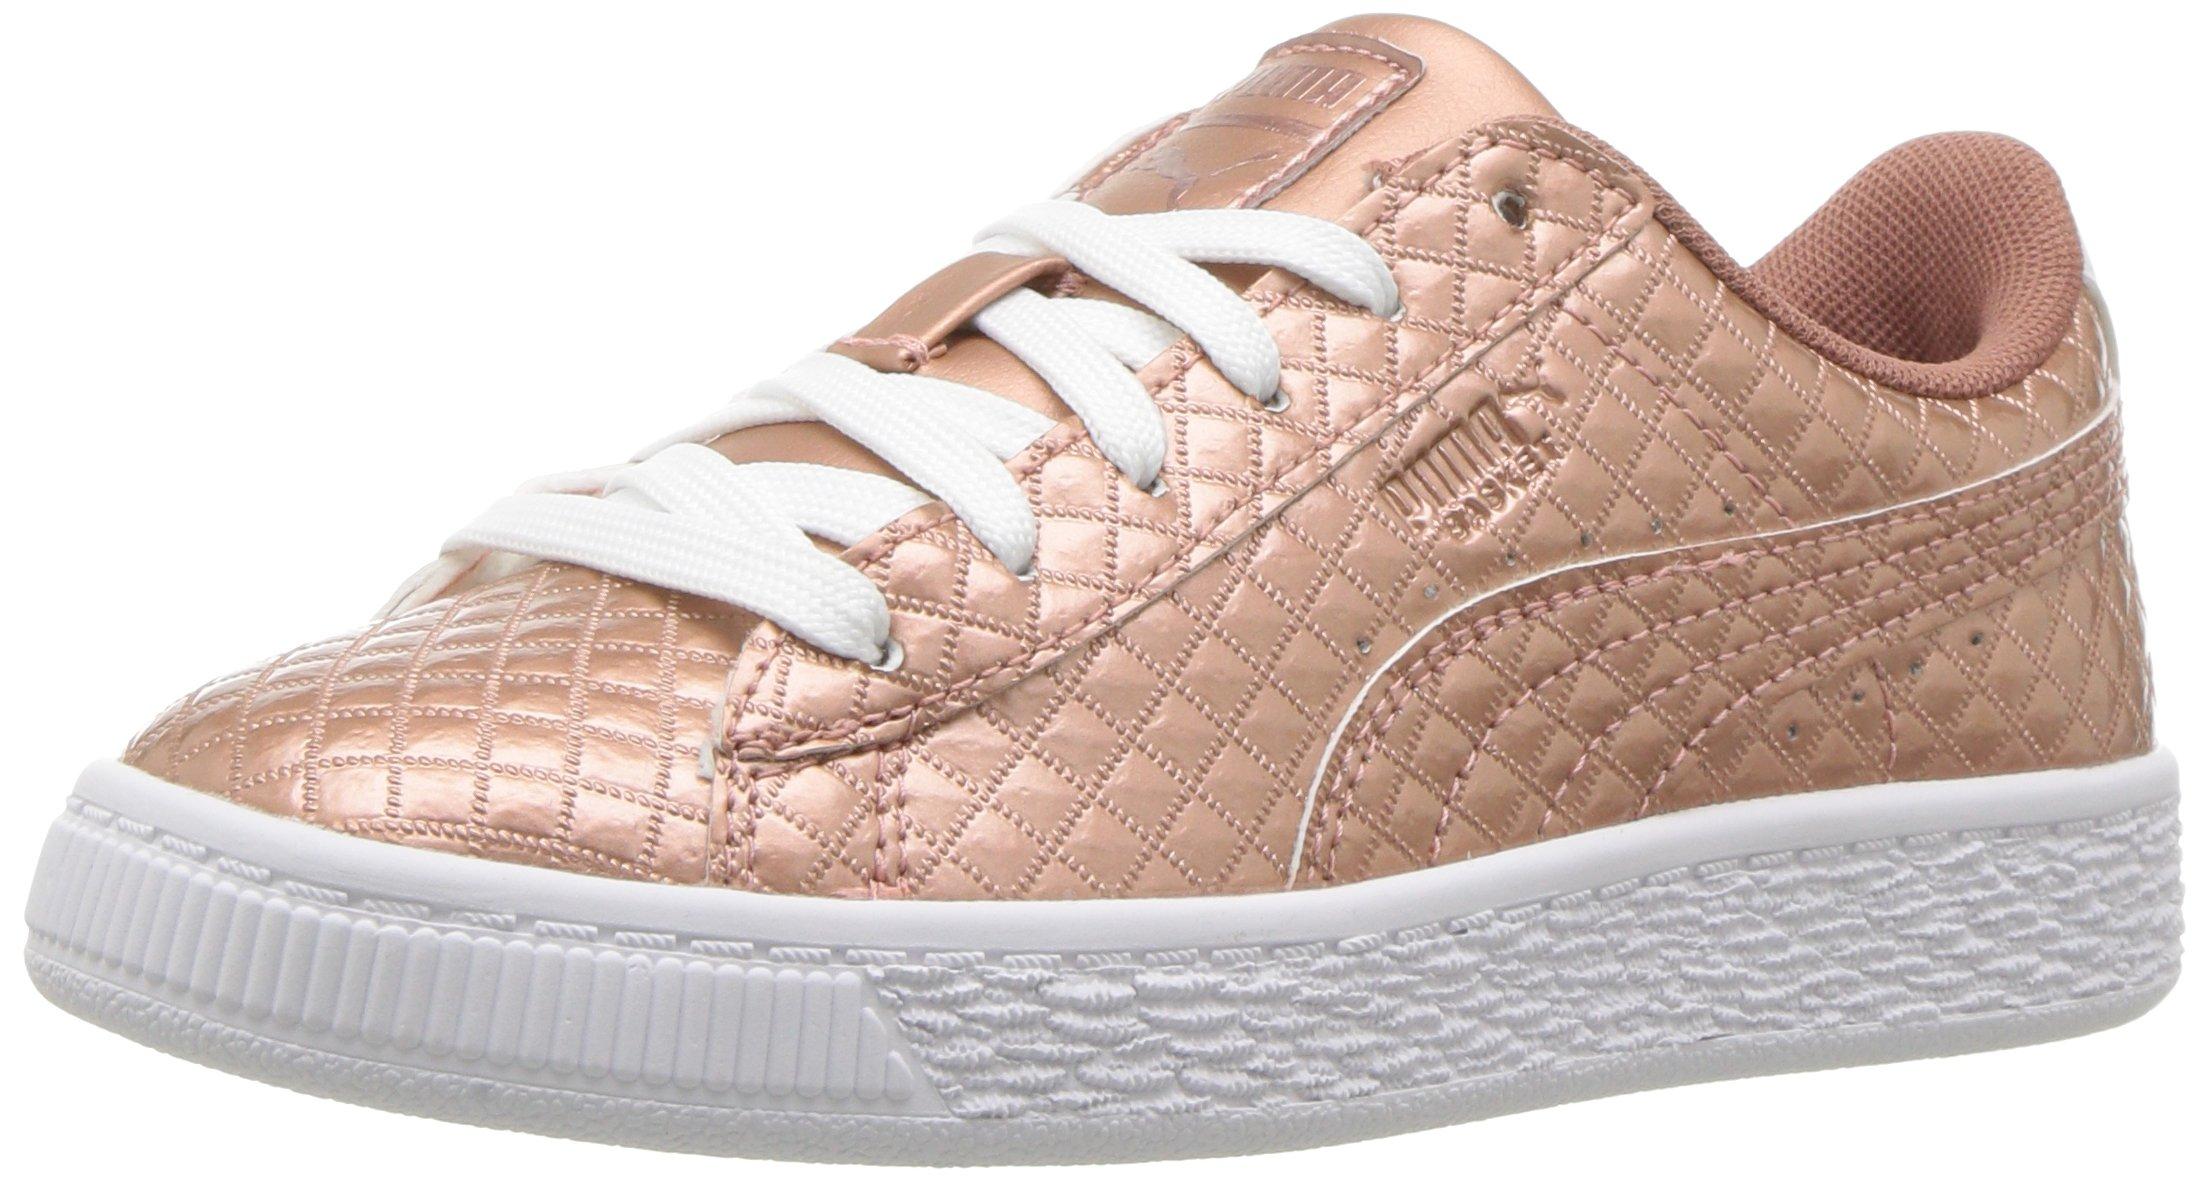 promo code 7f99d fb80c PUMA Kids' Basket Met Emboss Sneaker,Copper Rose-Puma White,2.5 M US Little  Kid